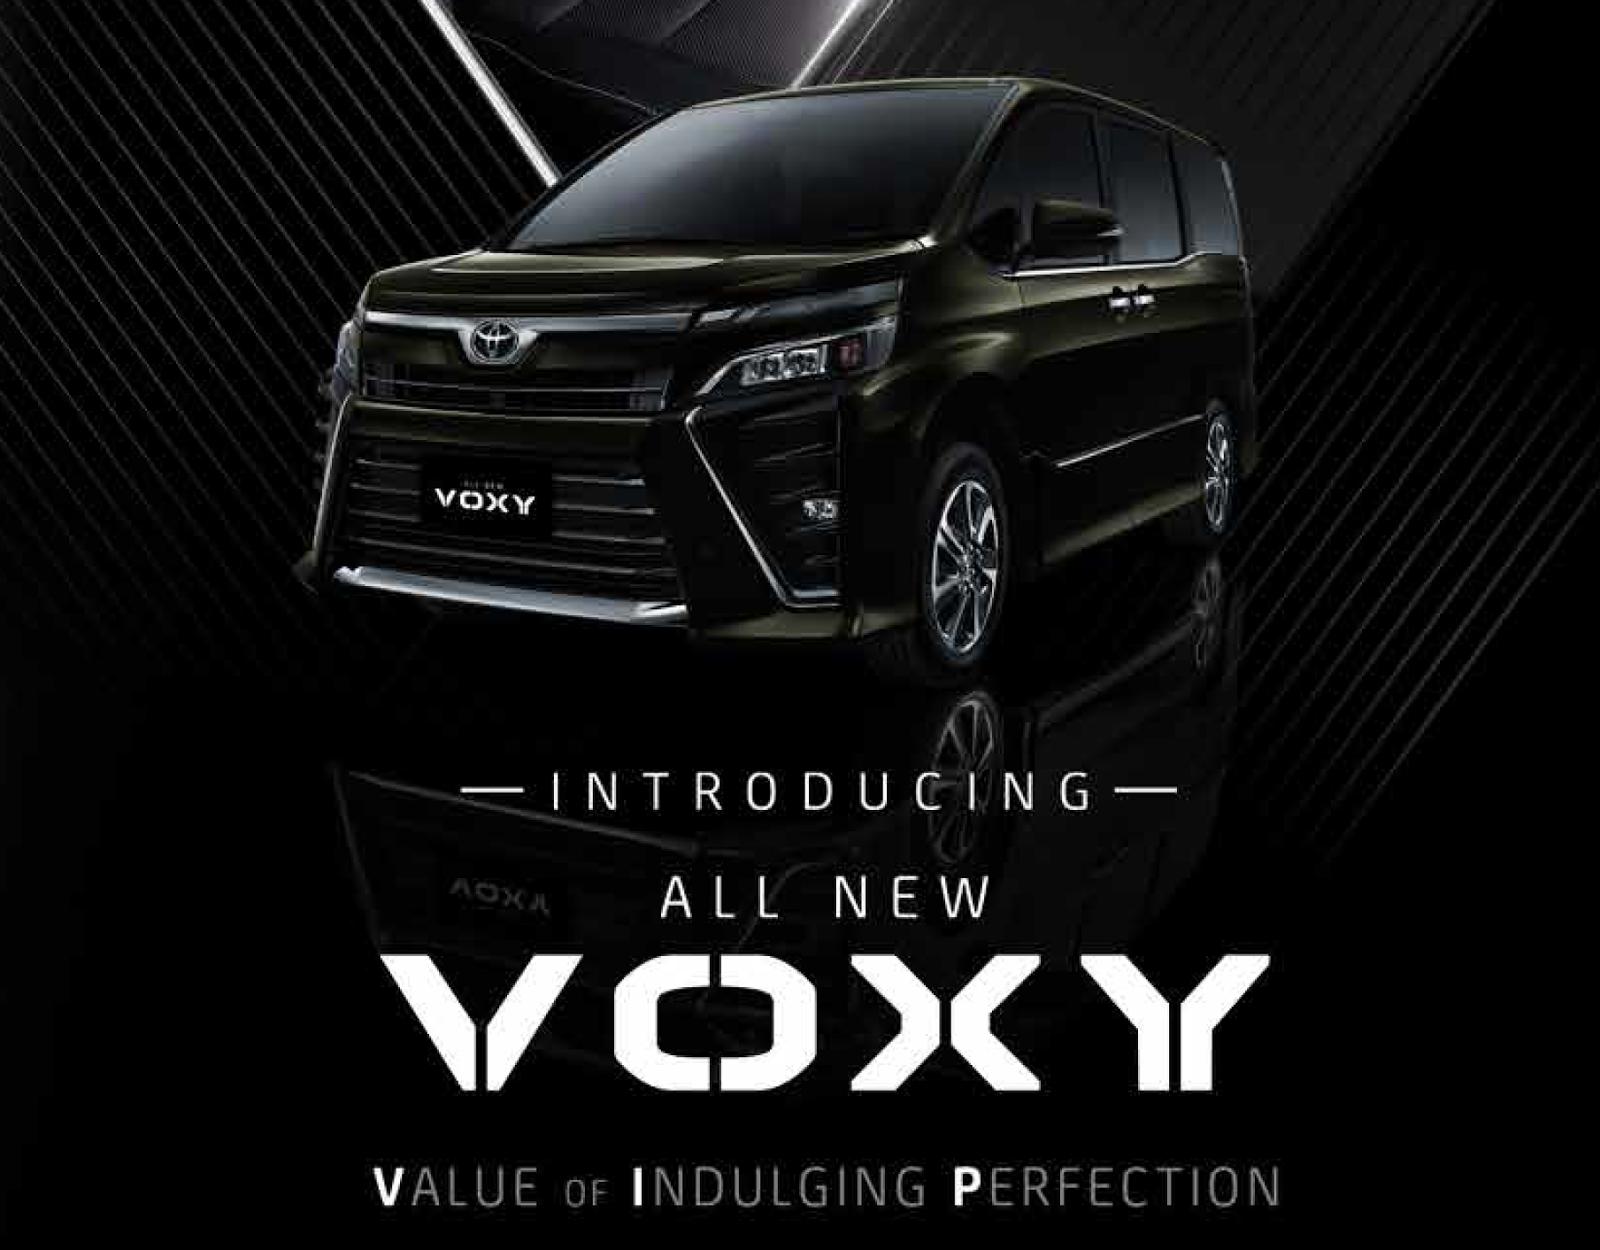 Harga All New Vellfire 2017 Alphard Type X Toyota Voxy Auto 2000 Medan 2019